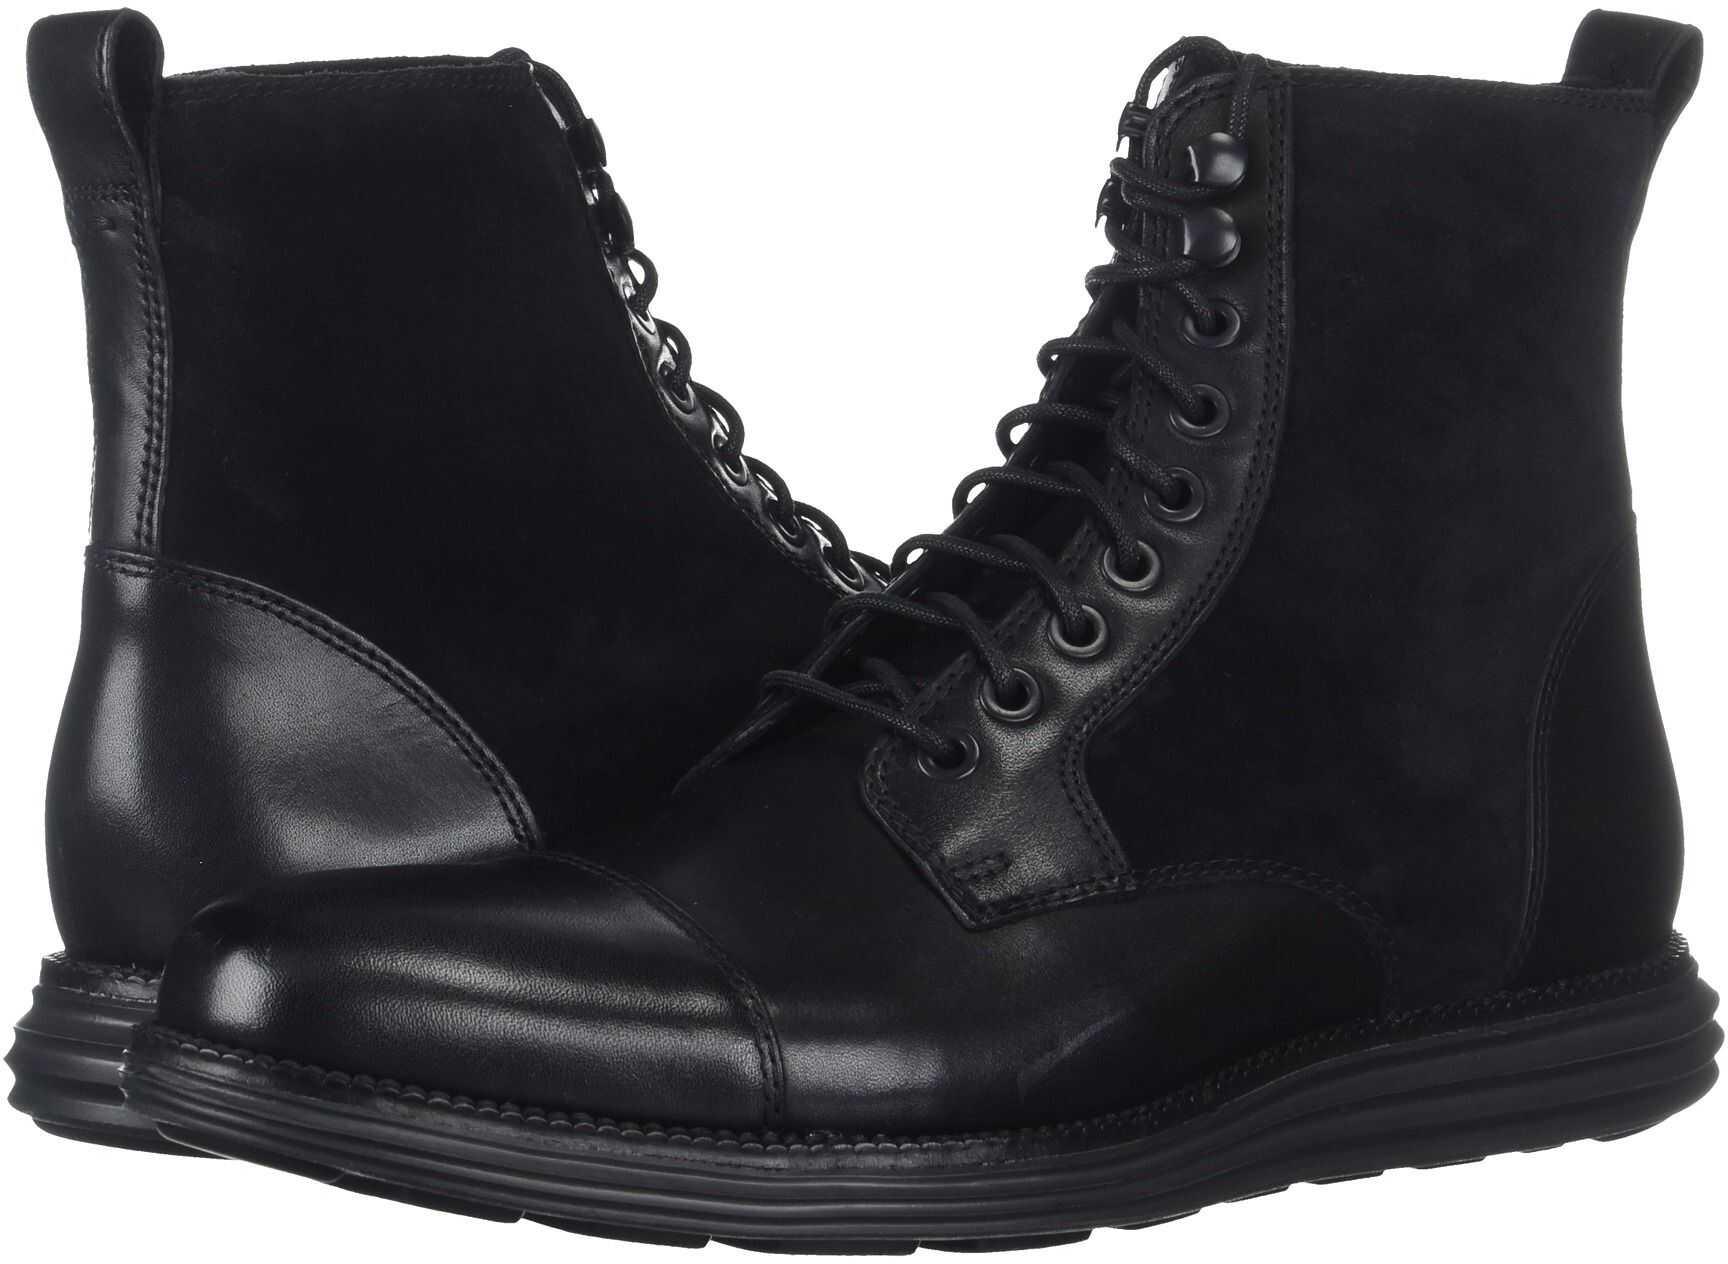 Cole Haan O.Original Grand Cap Toe Boot II Black/Black